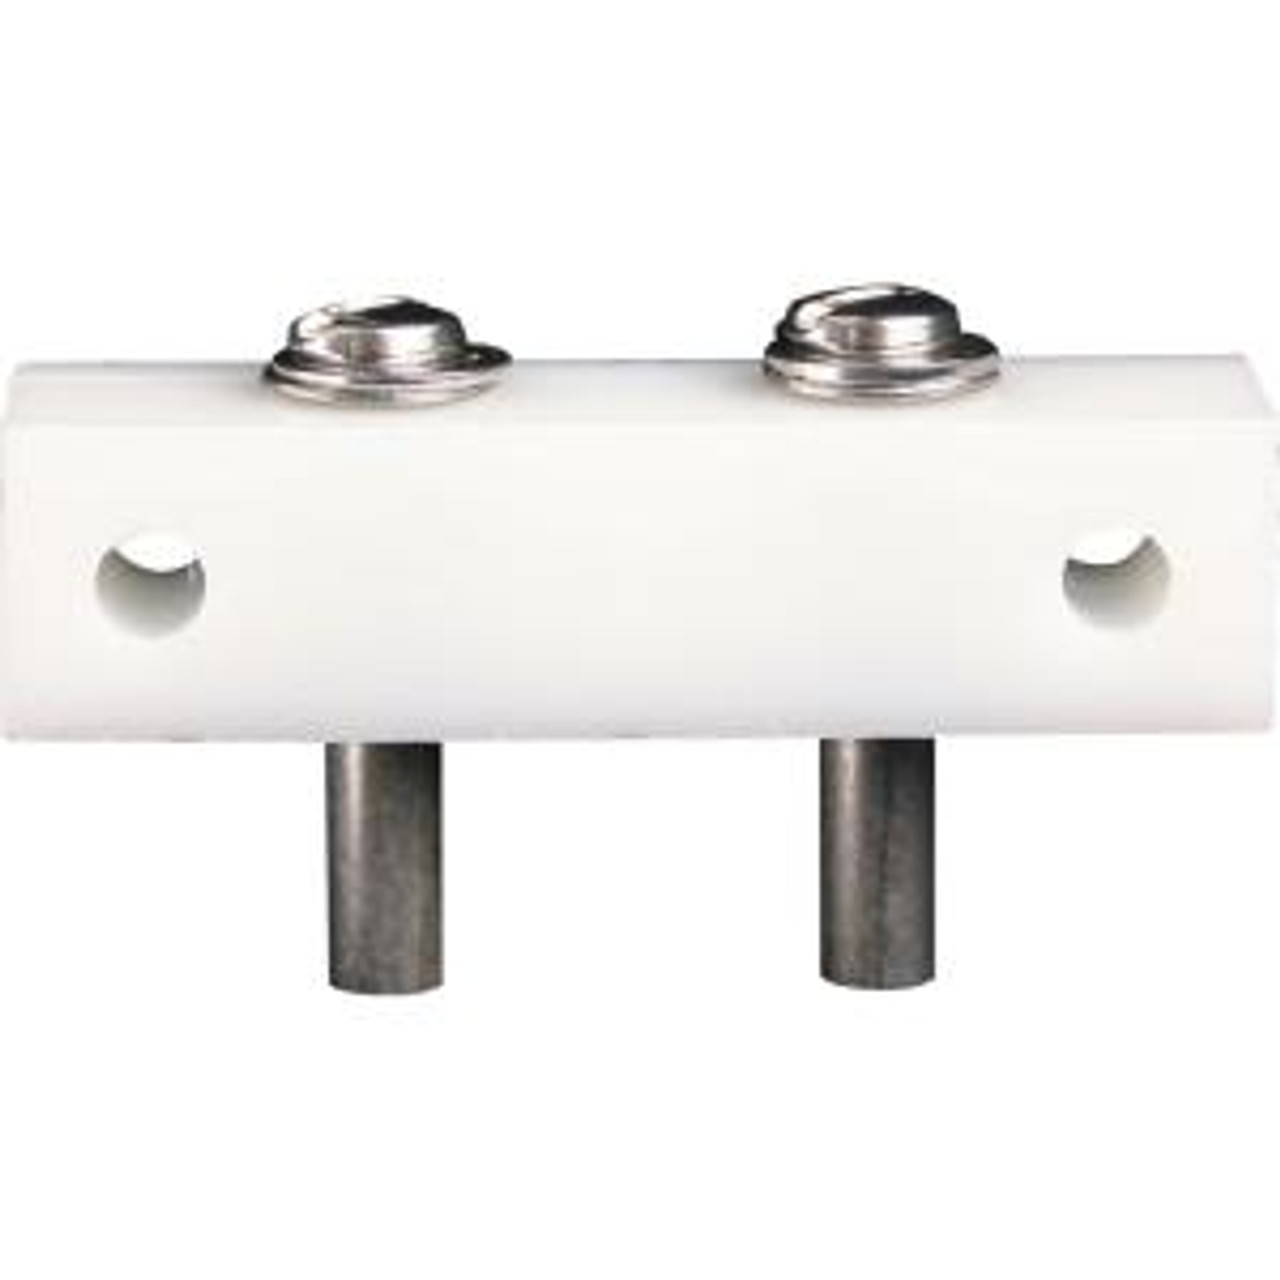 Honeywell 470PB Probe For Water Sensor